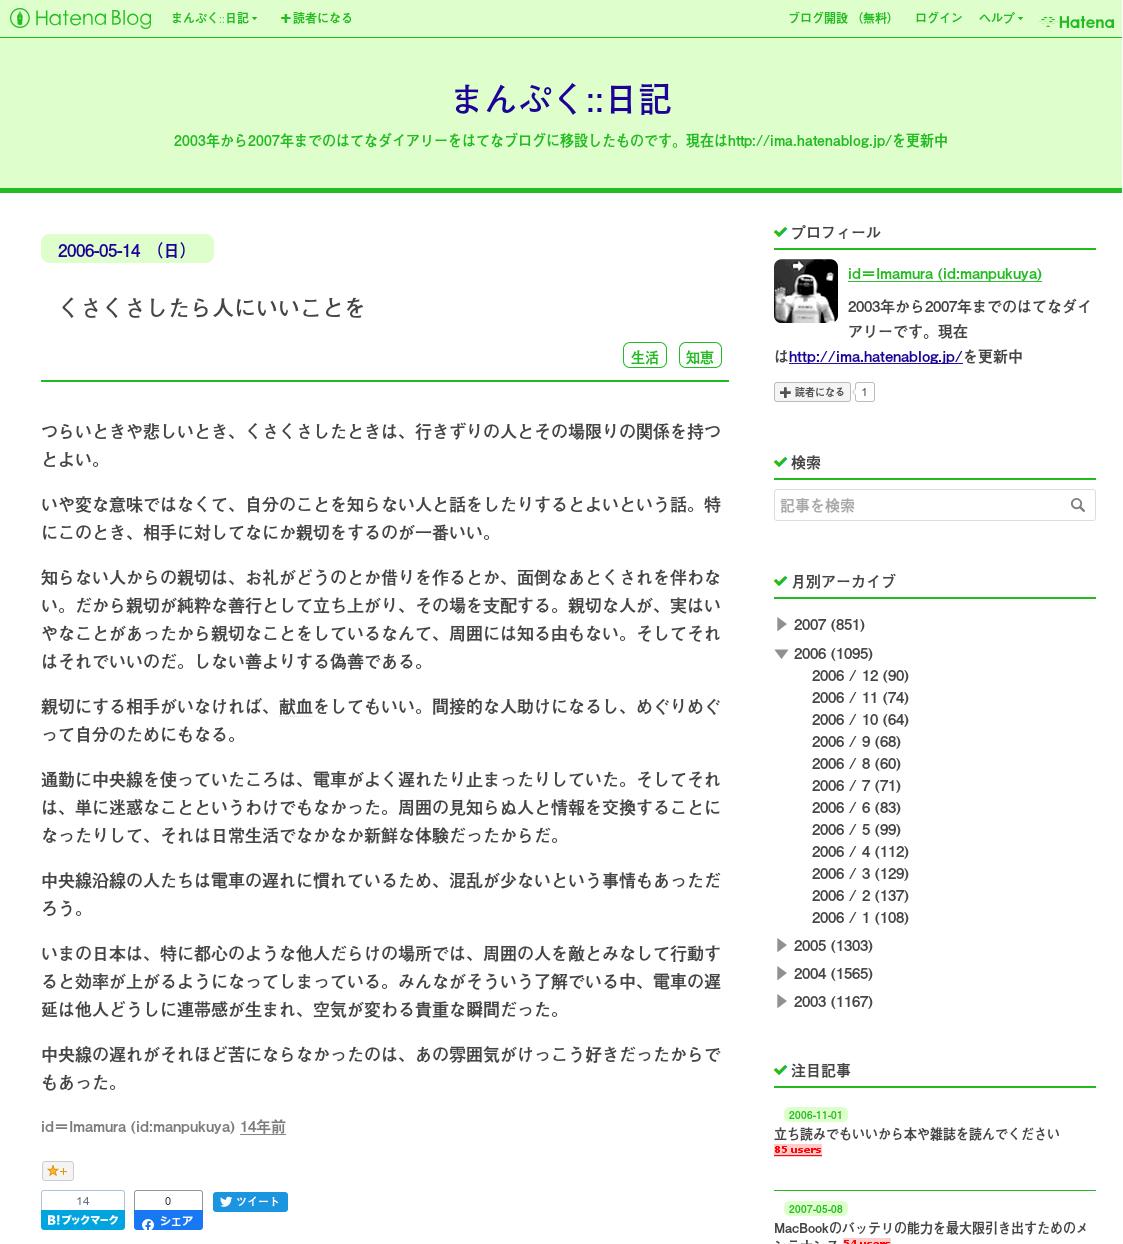 f:id:Imamura:20200620181418p:plain